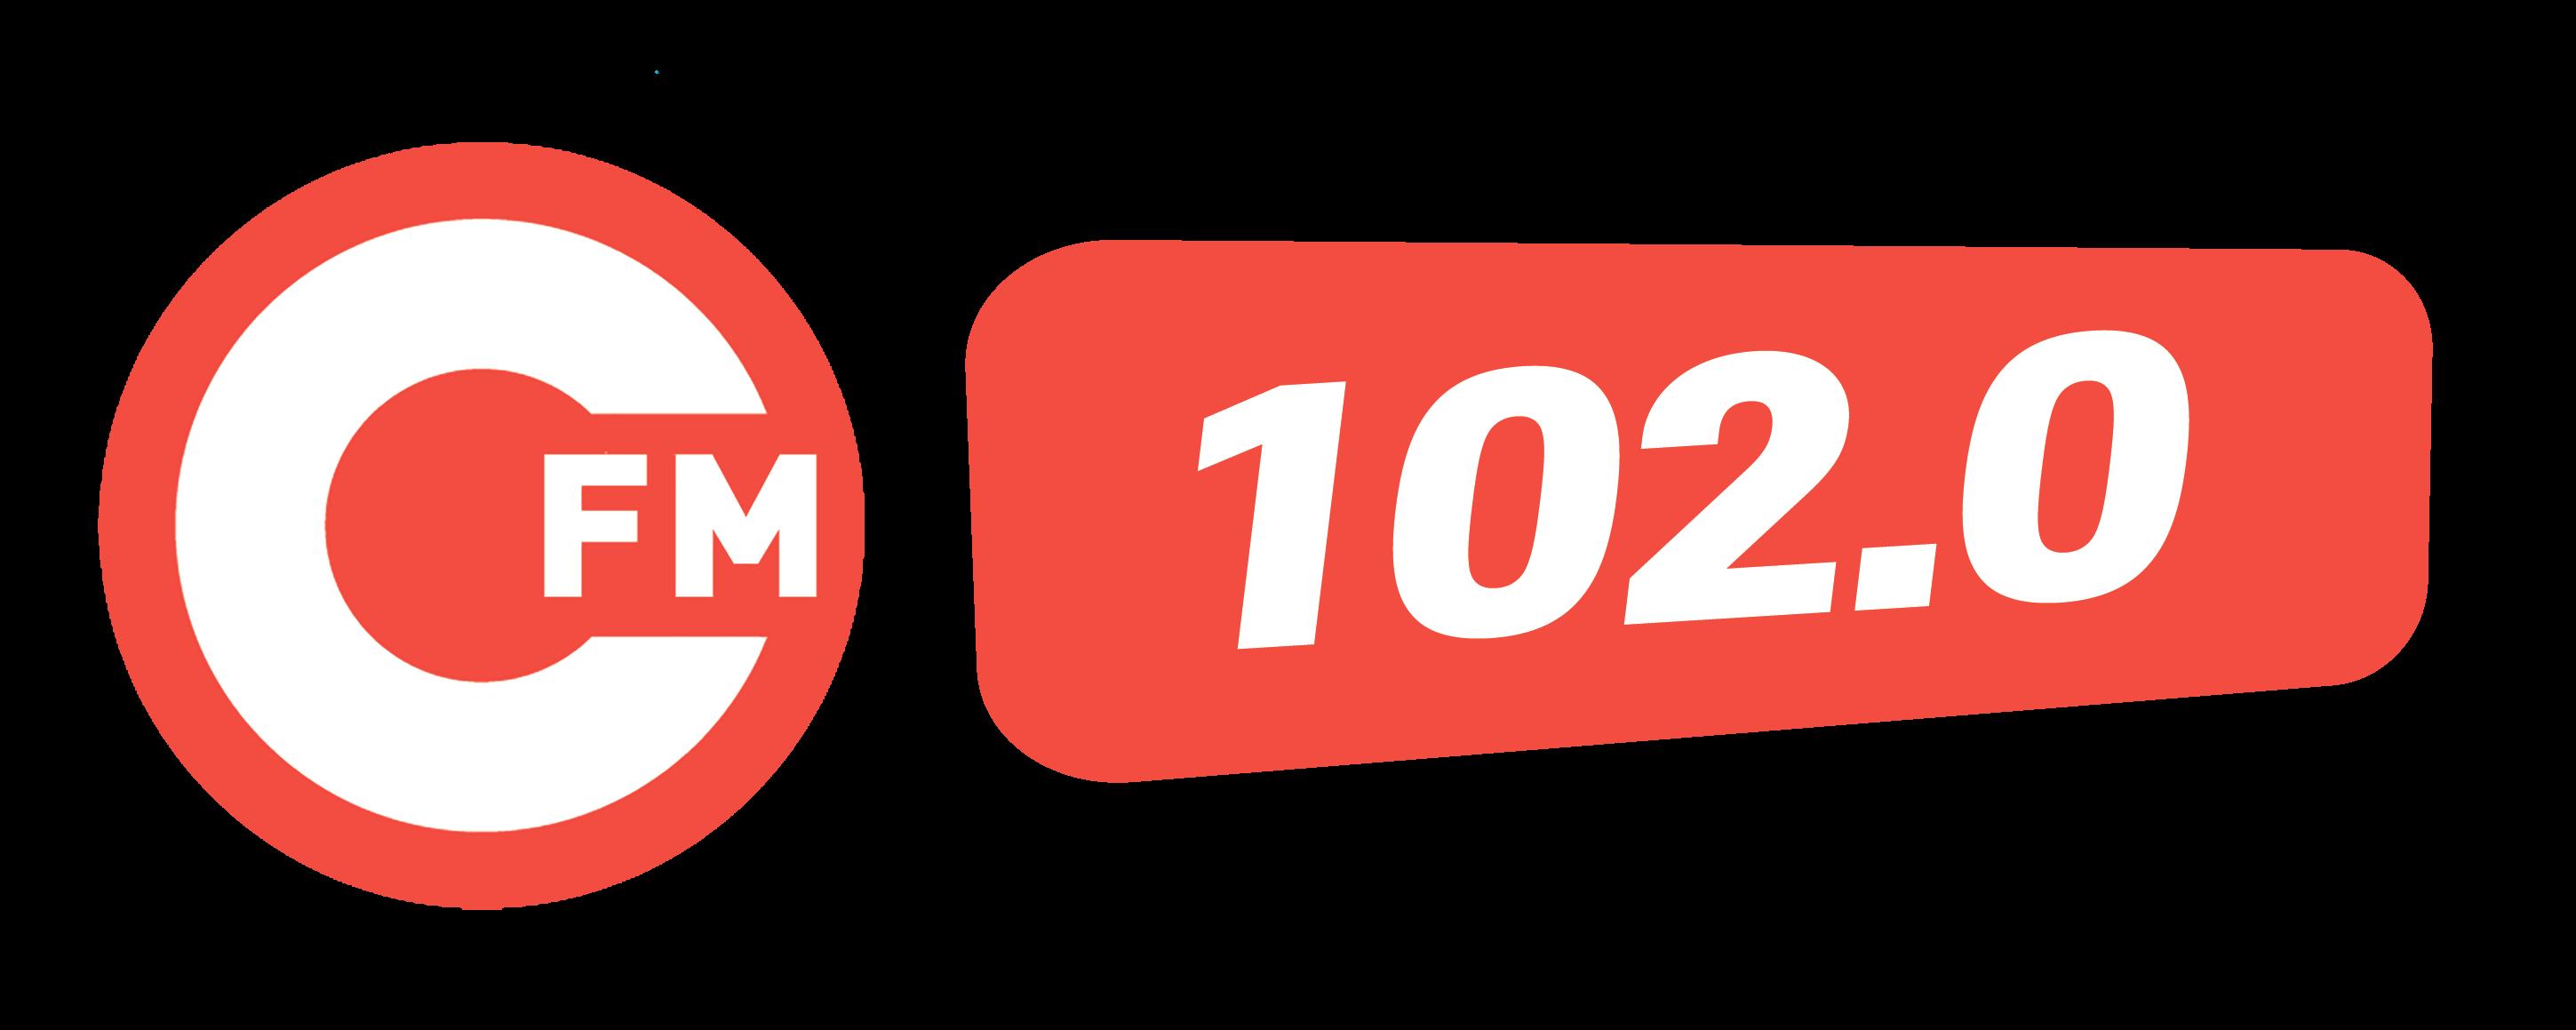 Севастополь FM 102.0 FM Онлайн Радио | Online Radio